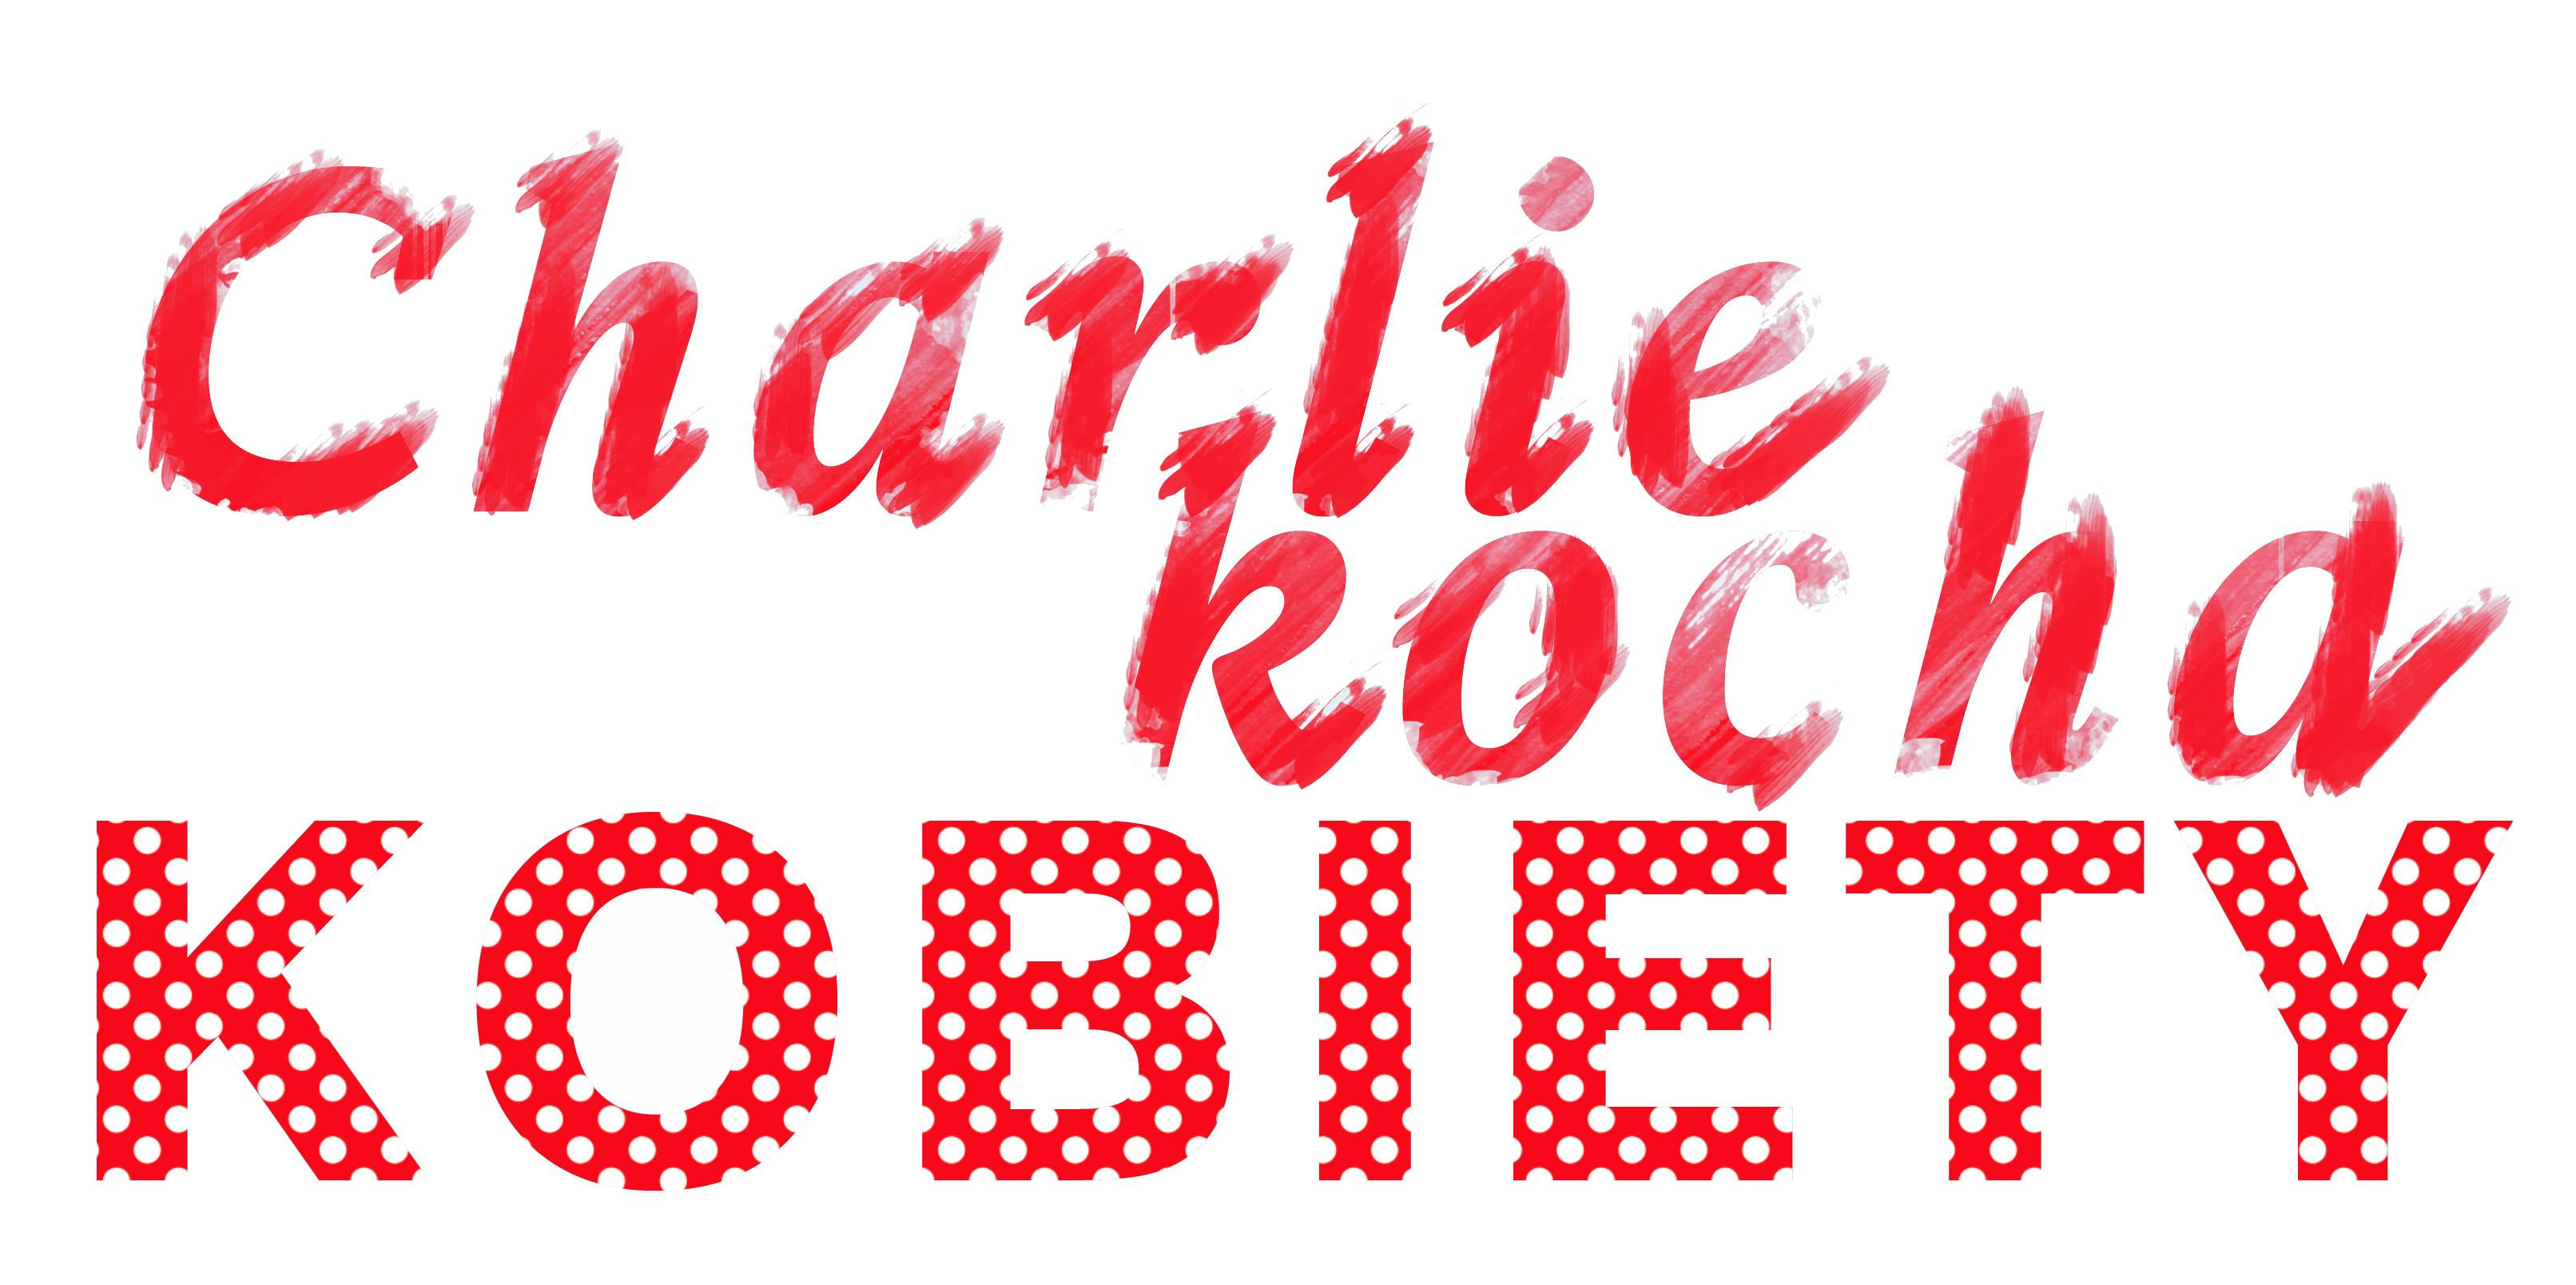 Charlie_kocha_kobiety_logo